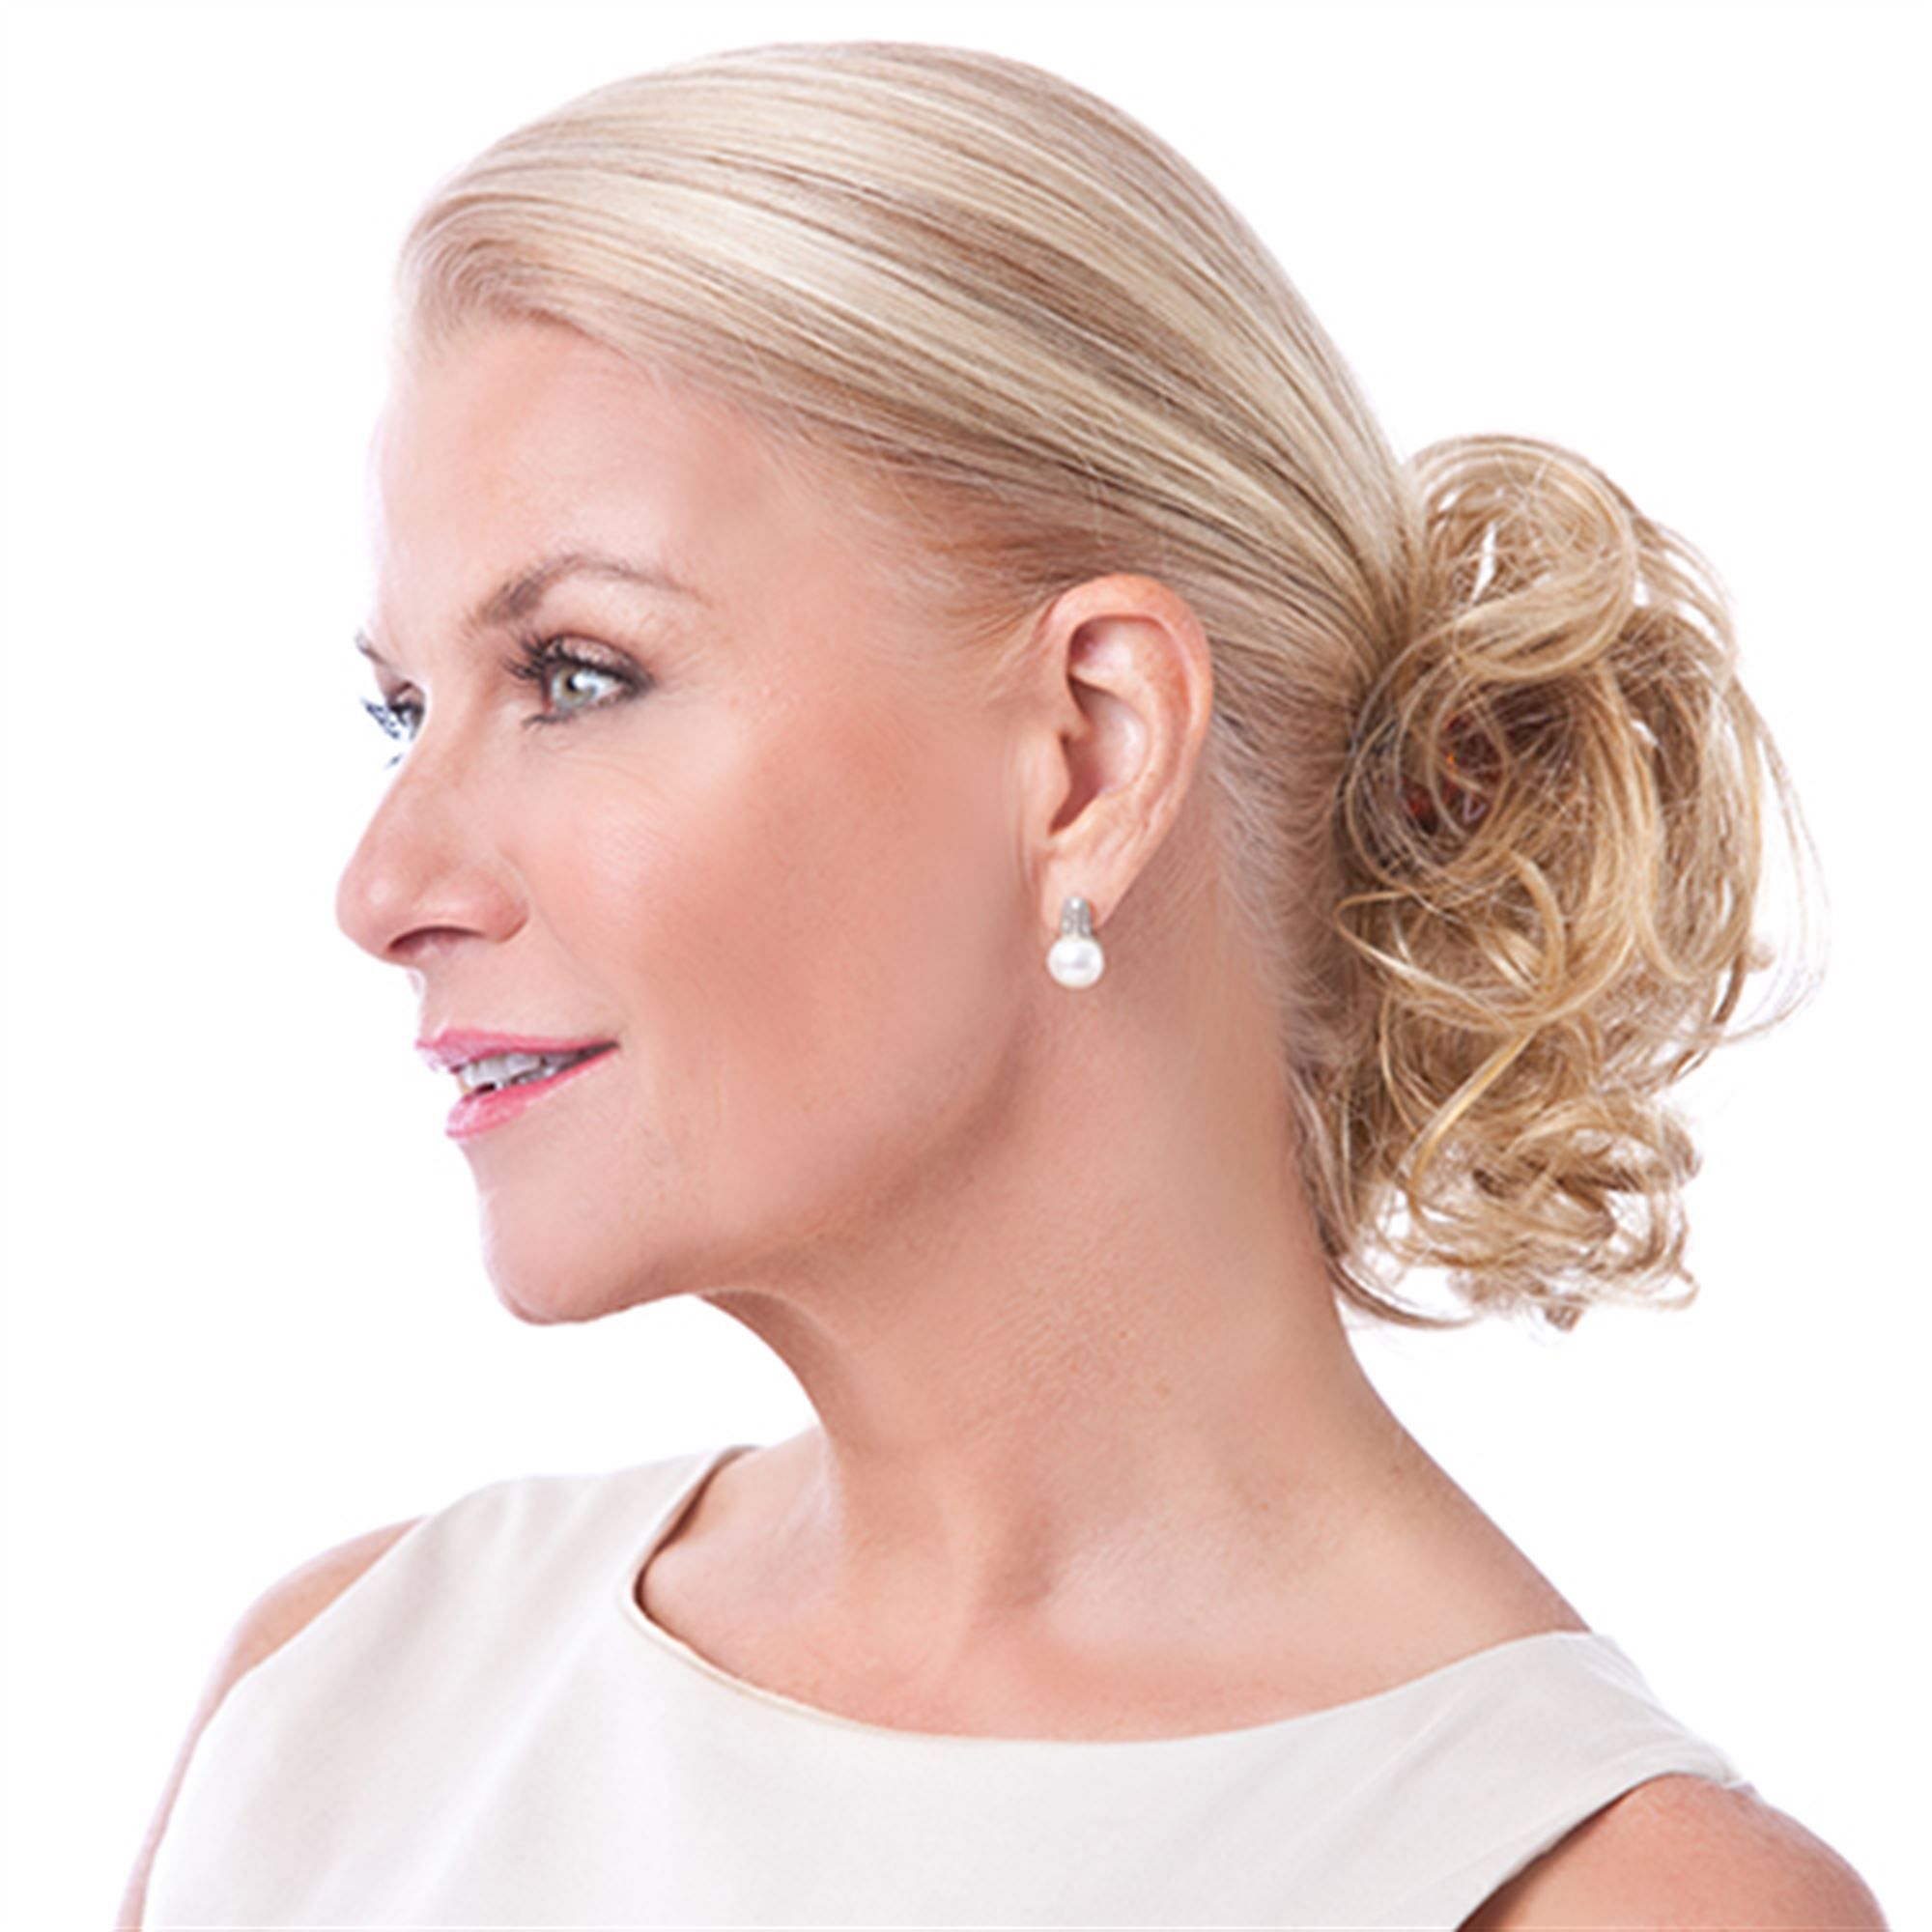 Enjoyable 17 Best Images About Toni Brattin On Pinterest Cap Dagde Curls Short Hairstyles Gunalazisus